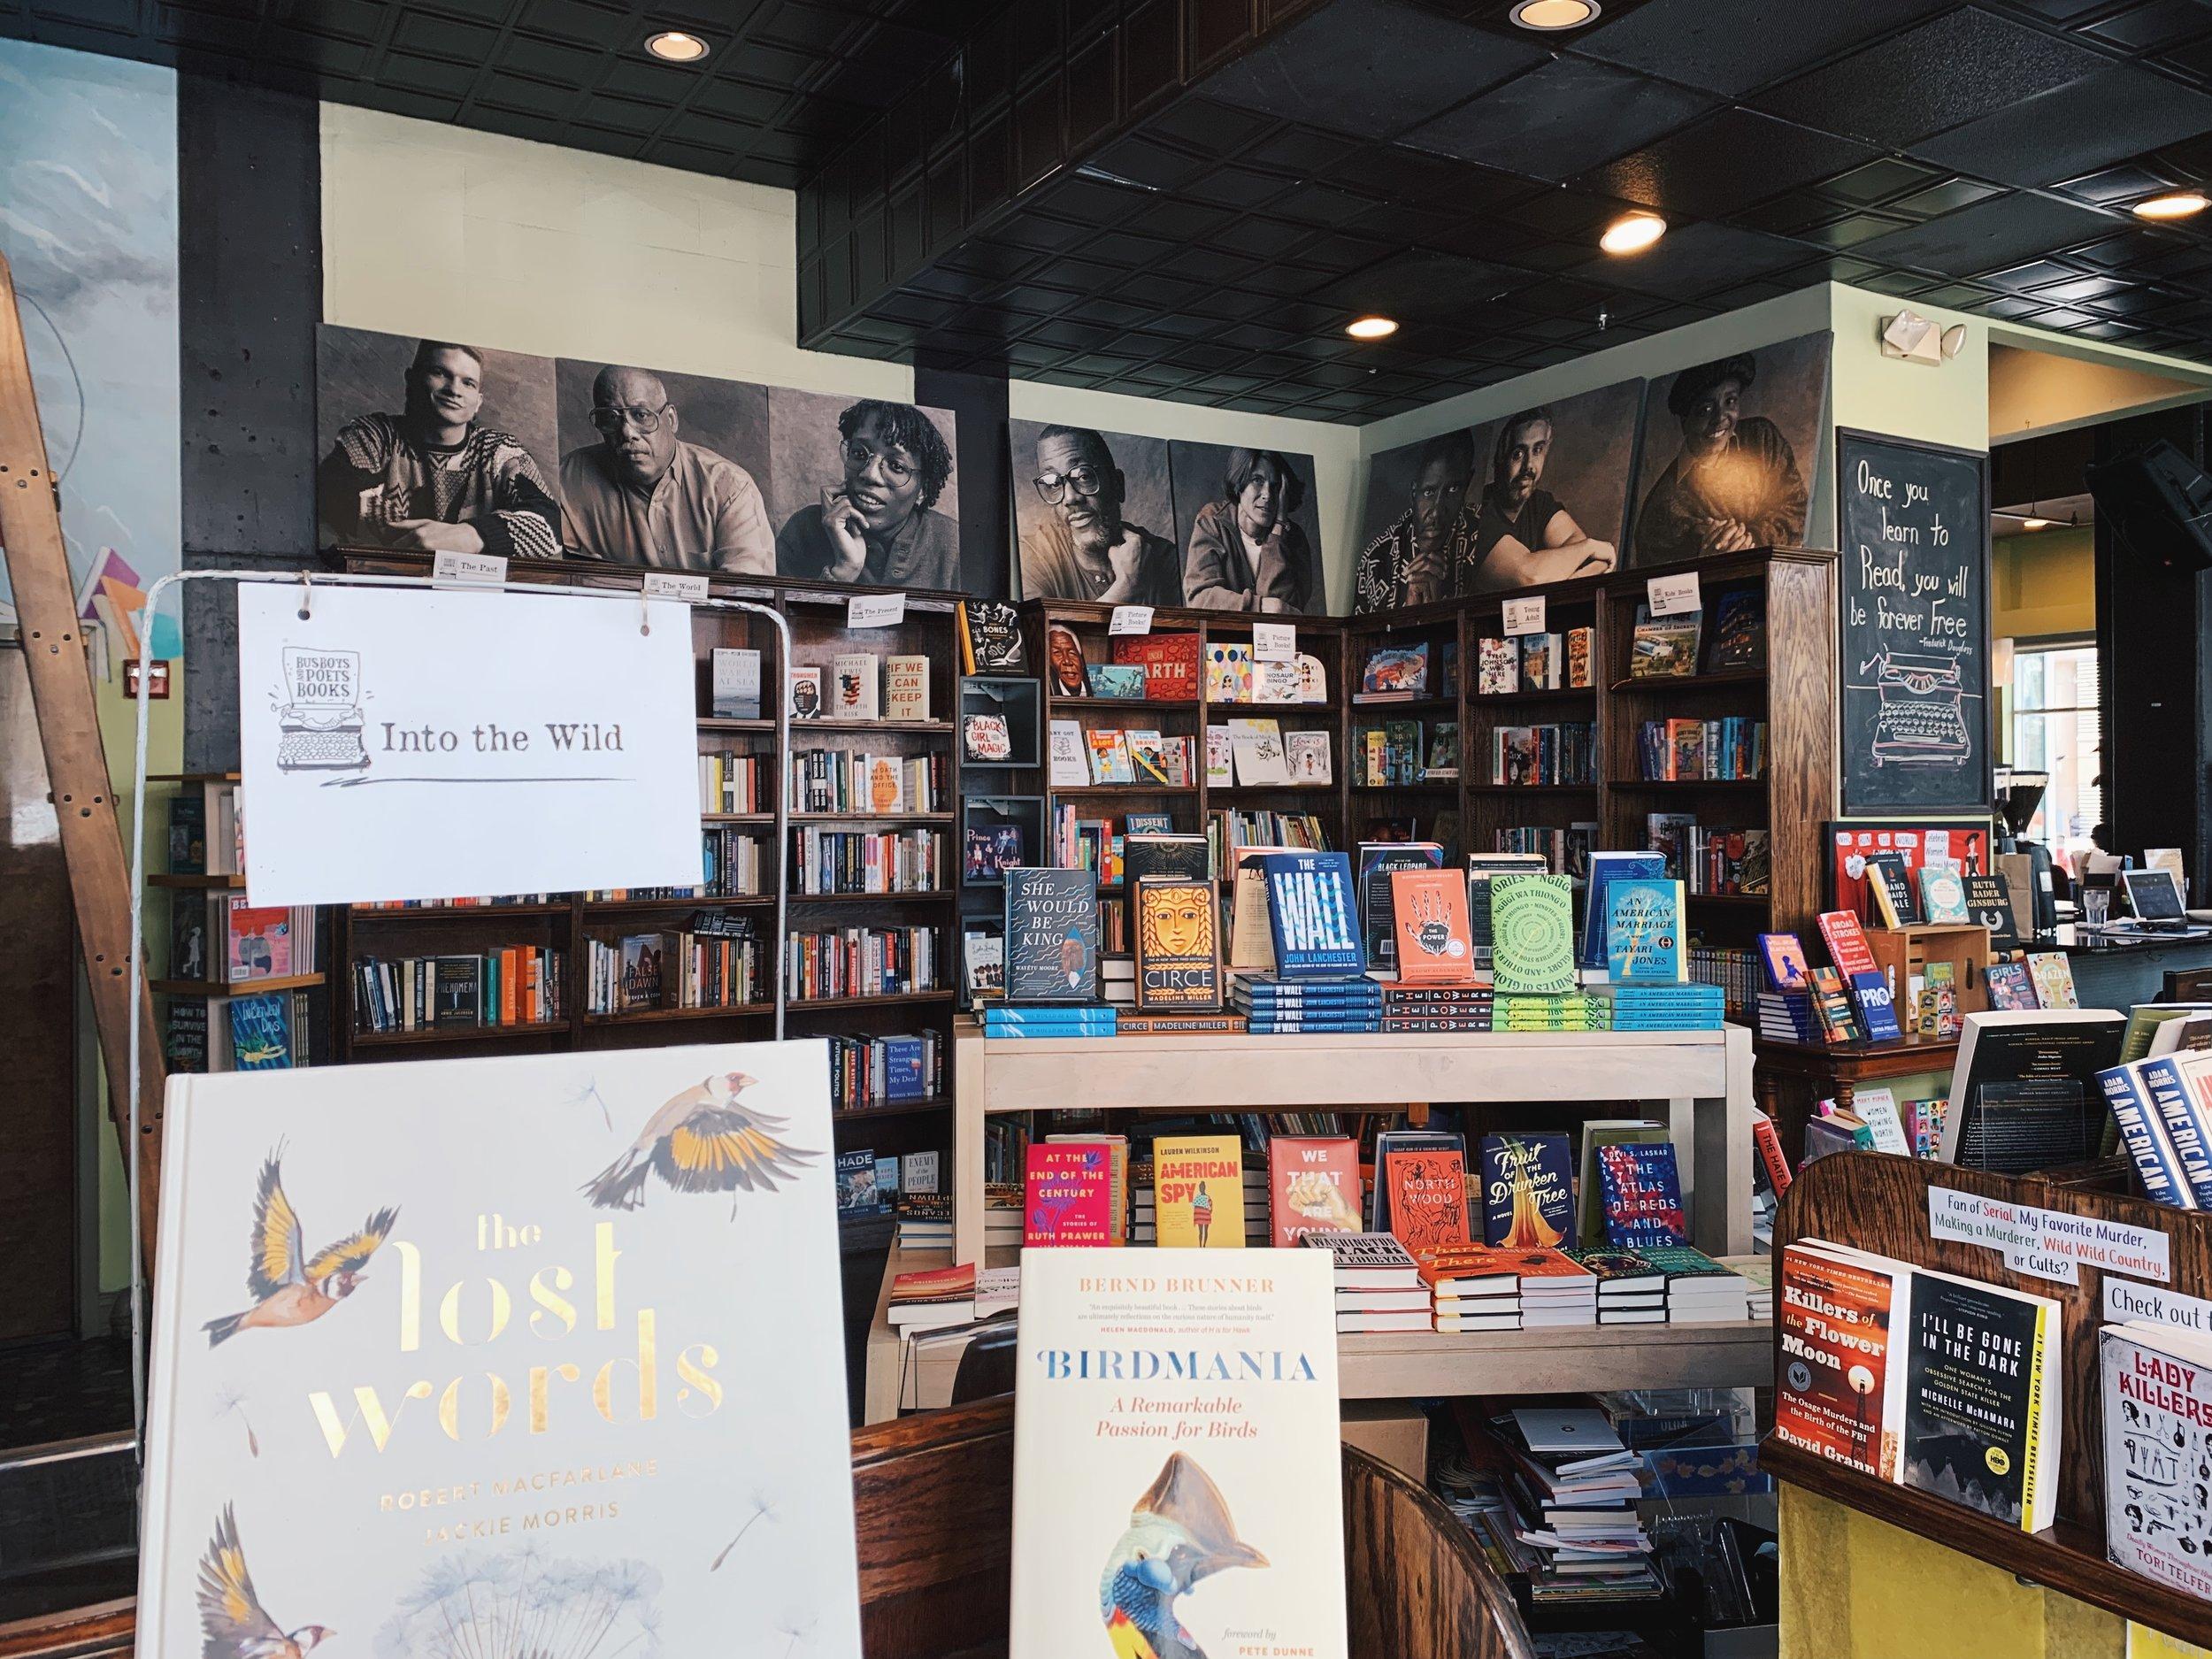 Busboys & Poets Bookshop Washington DC The Attic on Eighth 3.JPG